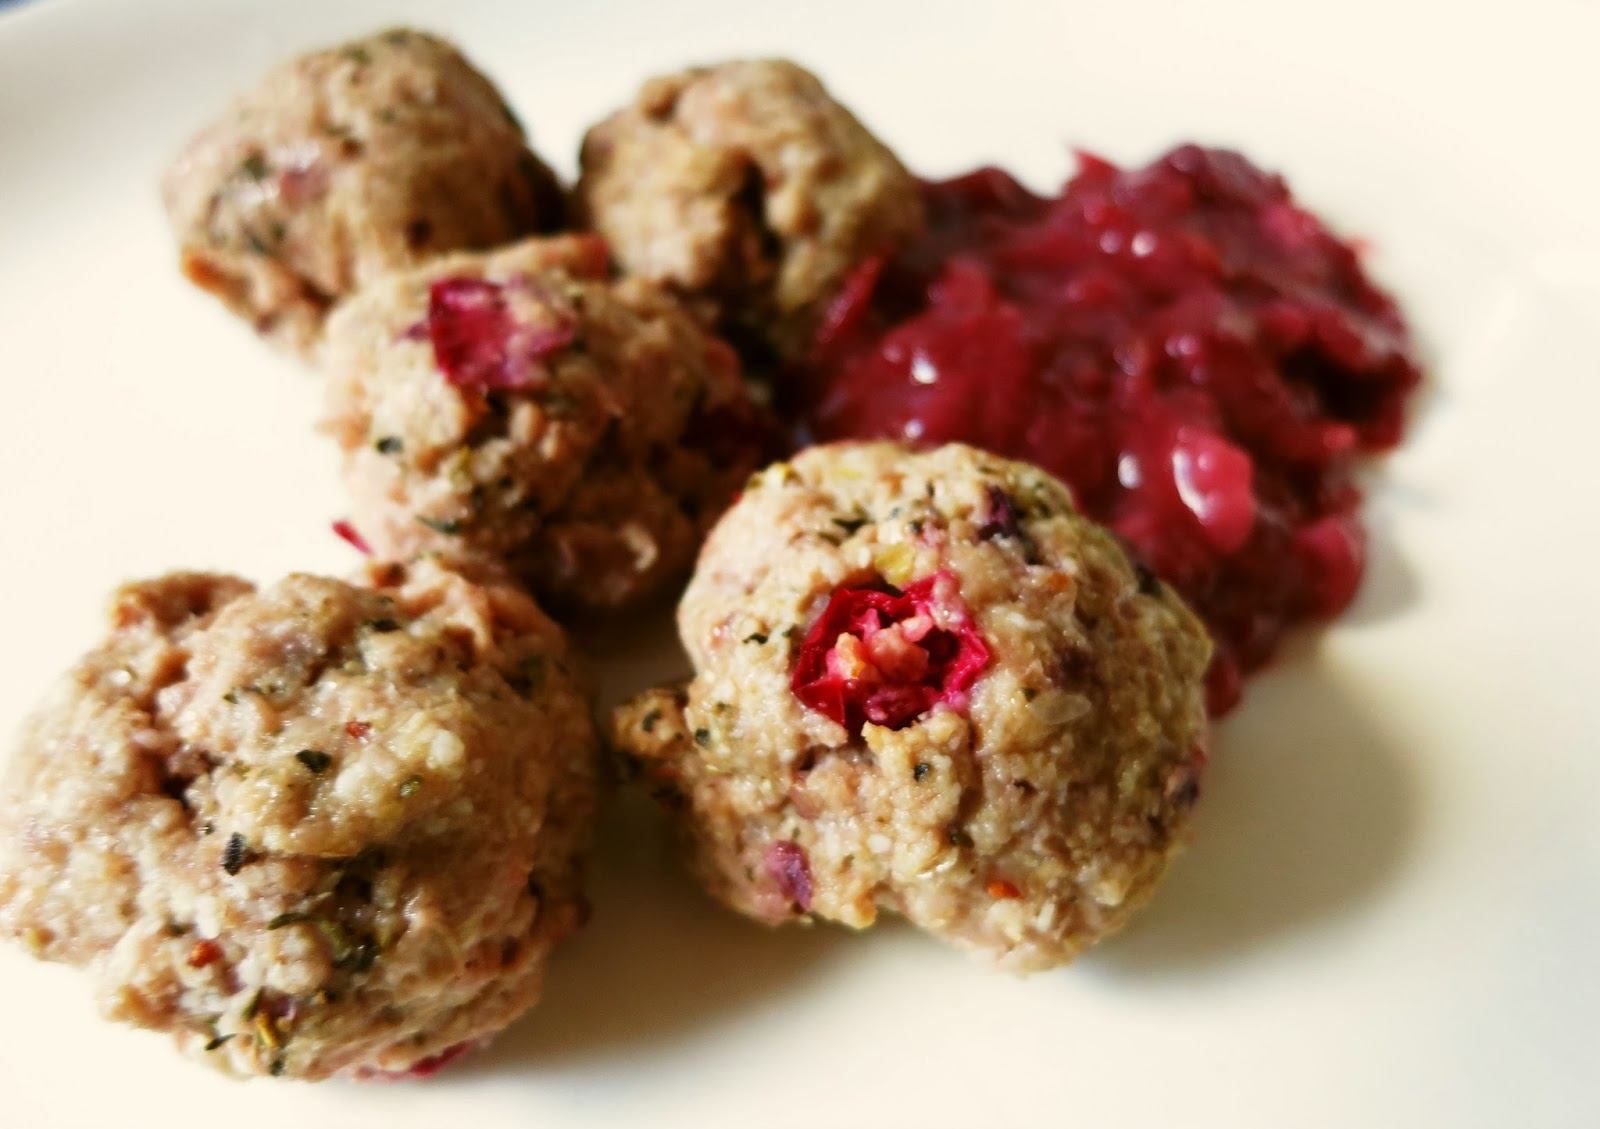 Cranberry-Parmesan Meatballs